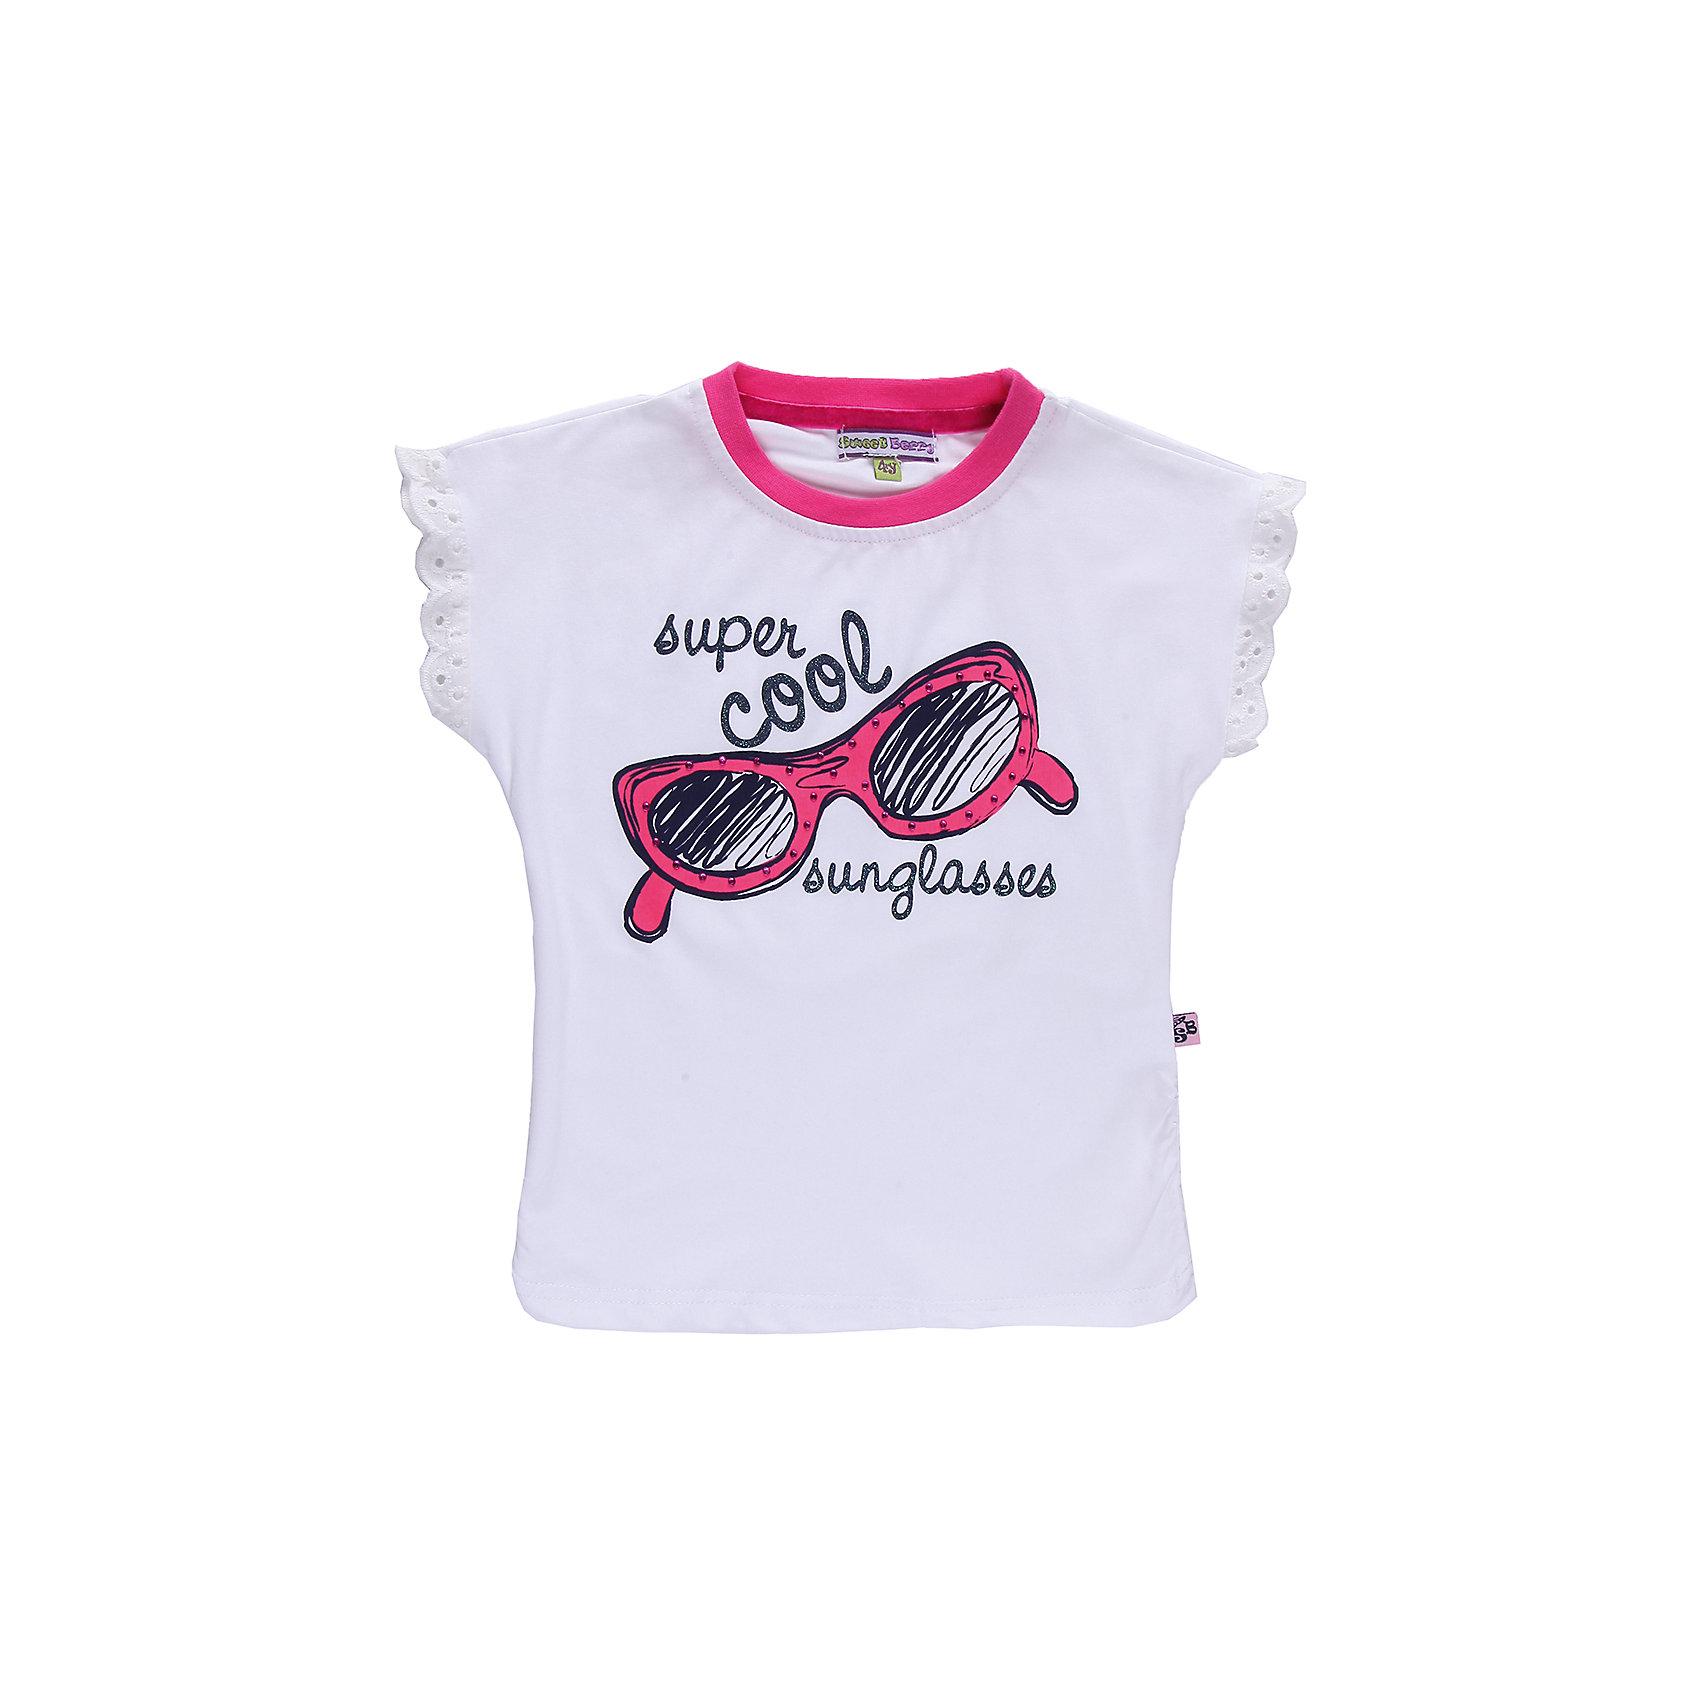 Футболка для девочки Sweet BerryРомантичная футболка из трикотажа. Декорирована кружевом и стразами.<br>Состав:<br>95% хлопок, 5% эластан<br><br>Ширина мм: 199<br>Глубина мм: 10<br>Высота мм: 161<br>Вес г: 151<br>Цвет: белый<br>Возраст от месяцев: 24<br>Возраст до месяцев: 36<br>Пол: Женский<br>Возраст: Детский<br>Размер: 98,110,104,128,122,116<br>SKU: 4520725